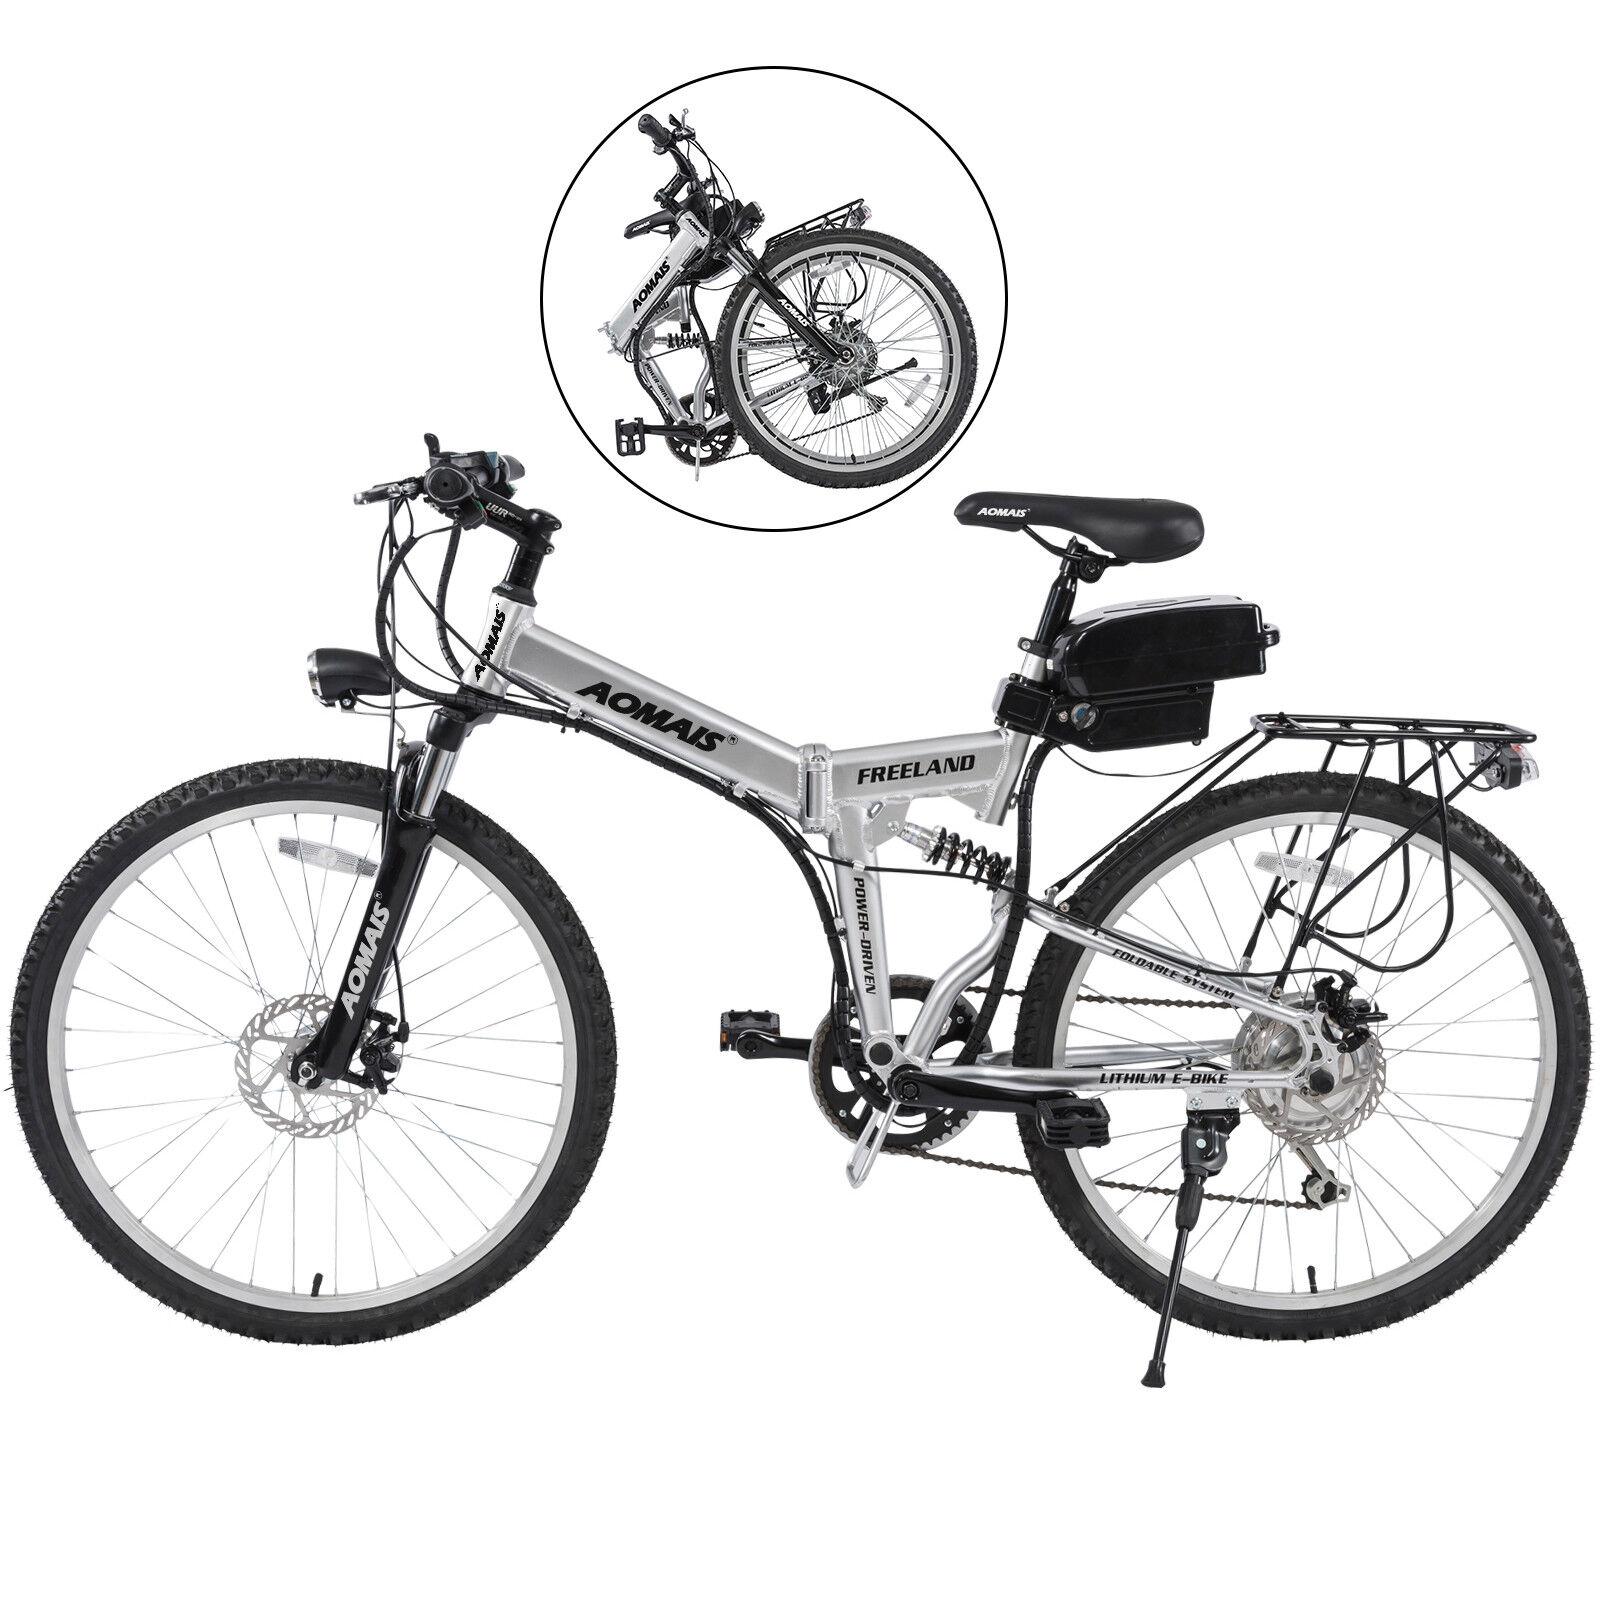 3dd10fa79e1 26 Electric Bicycle Aluminum Folding Mountain Cycling E-Bike 7 Speeds 36V  250W